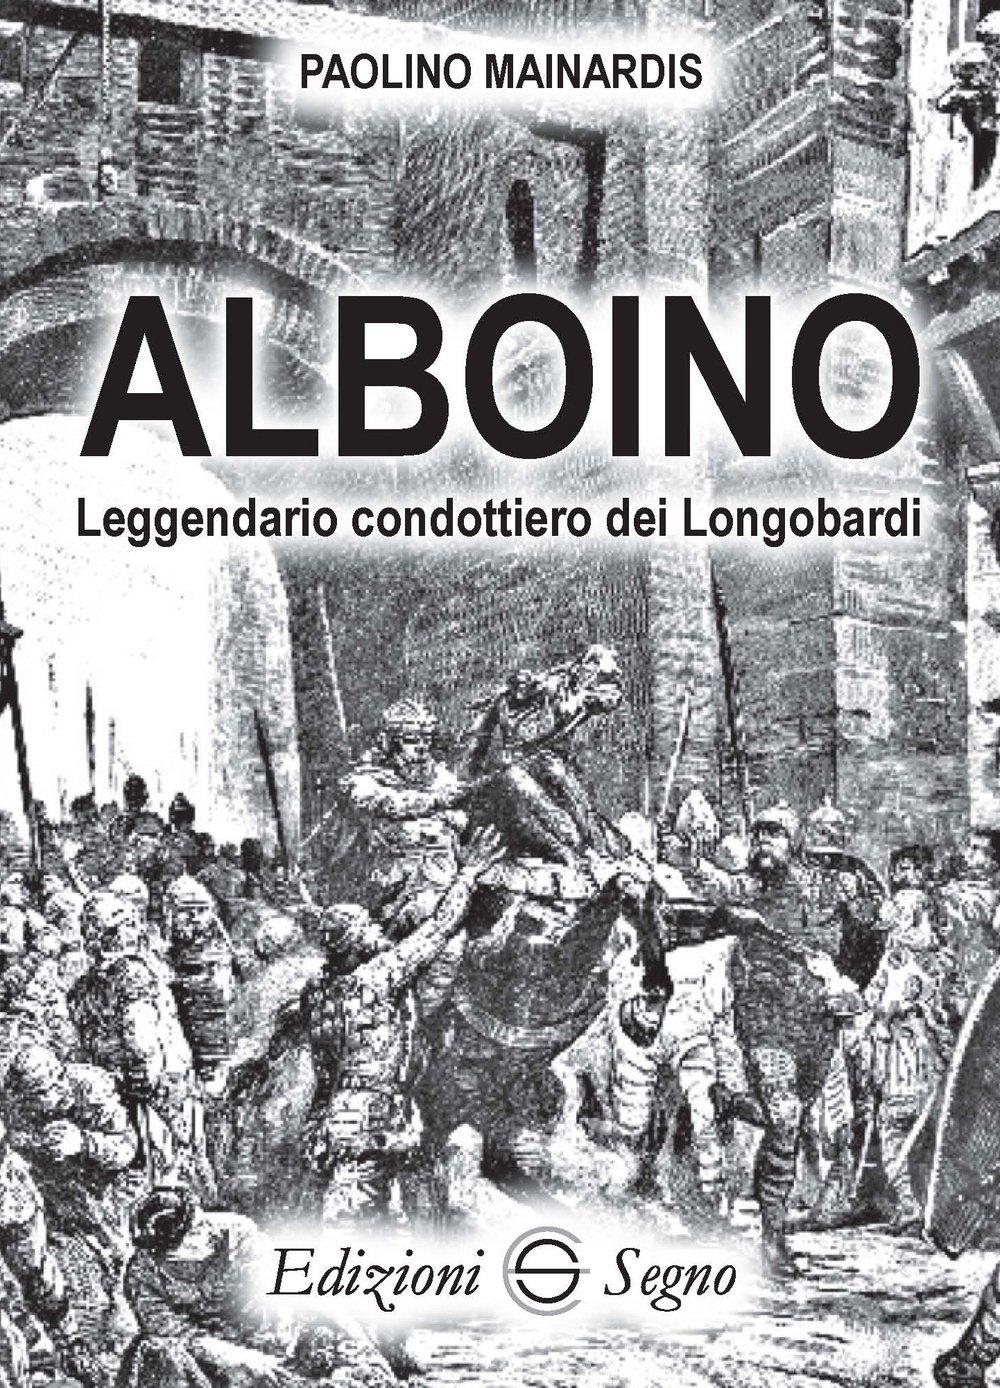 new product cba70 16742 Alboino. Leggendario condottiero dei Longobardi | www ...